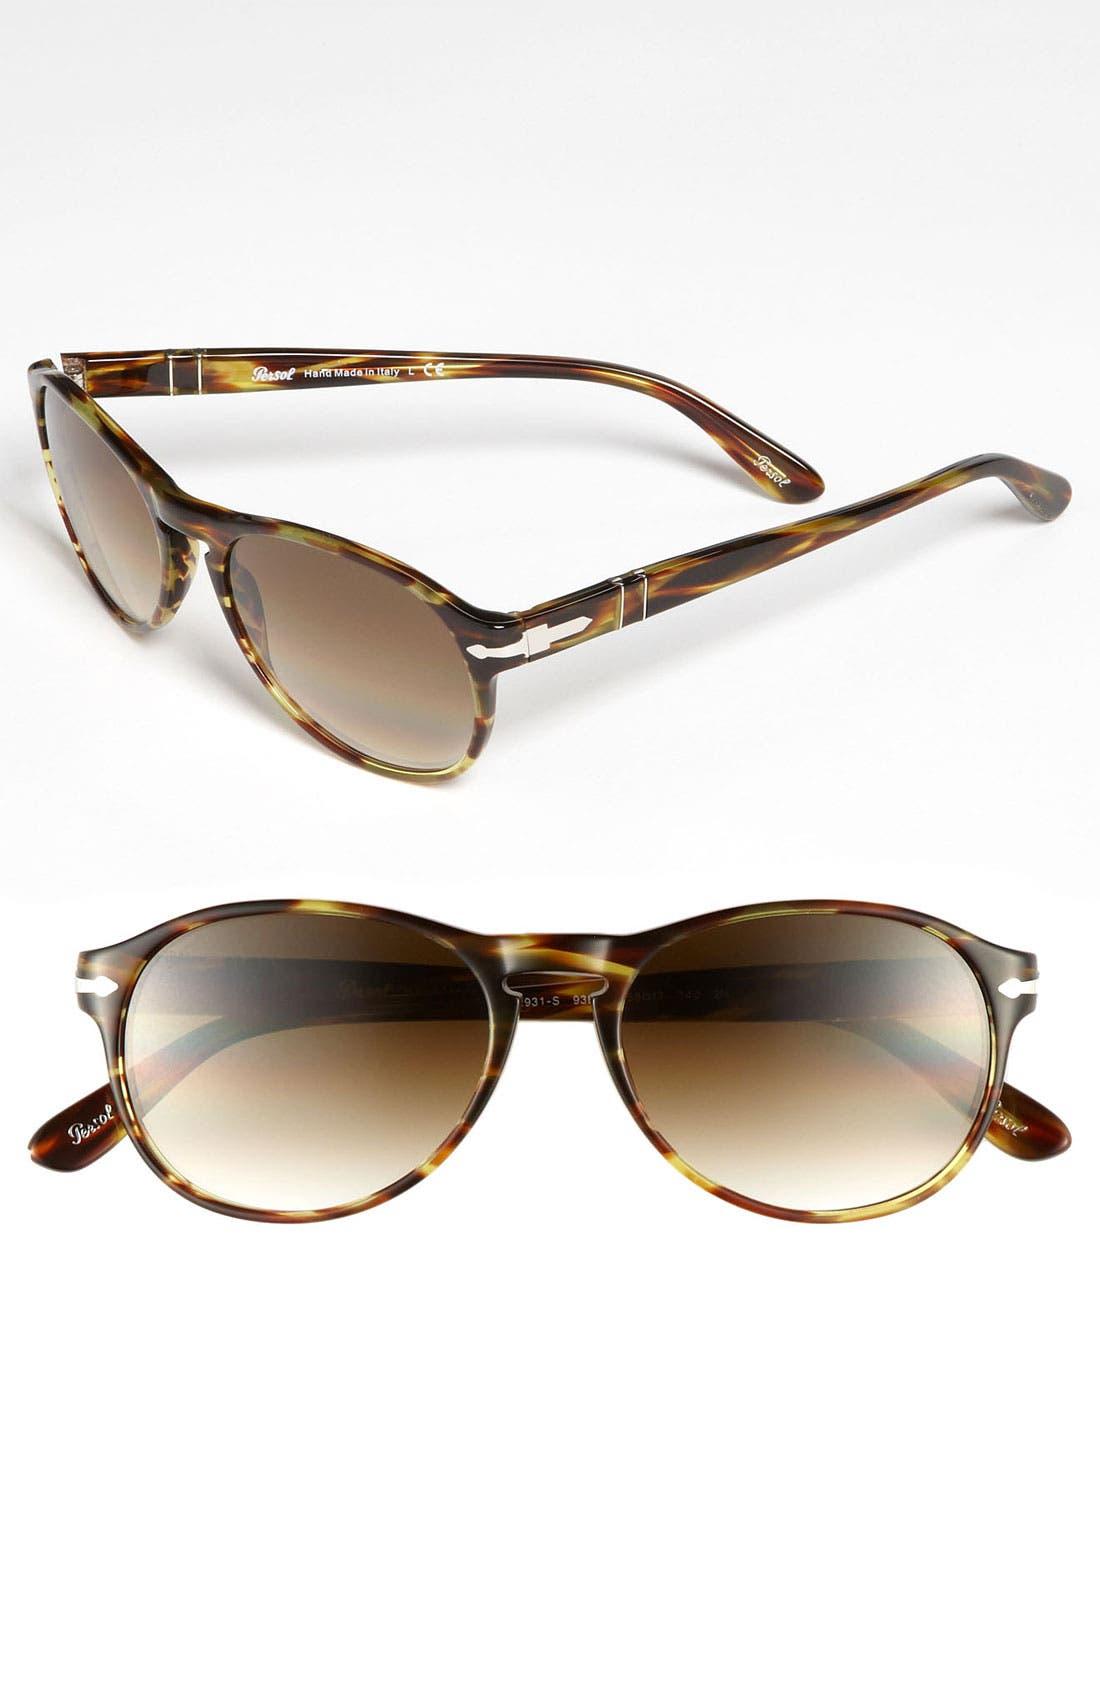 Main Image - Persol 55m Aviator Sunglasses